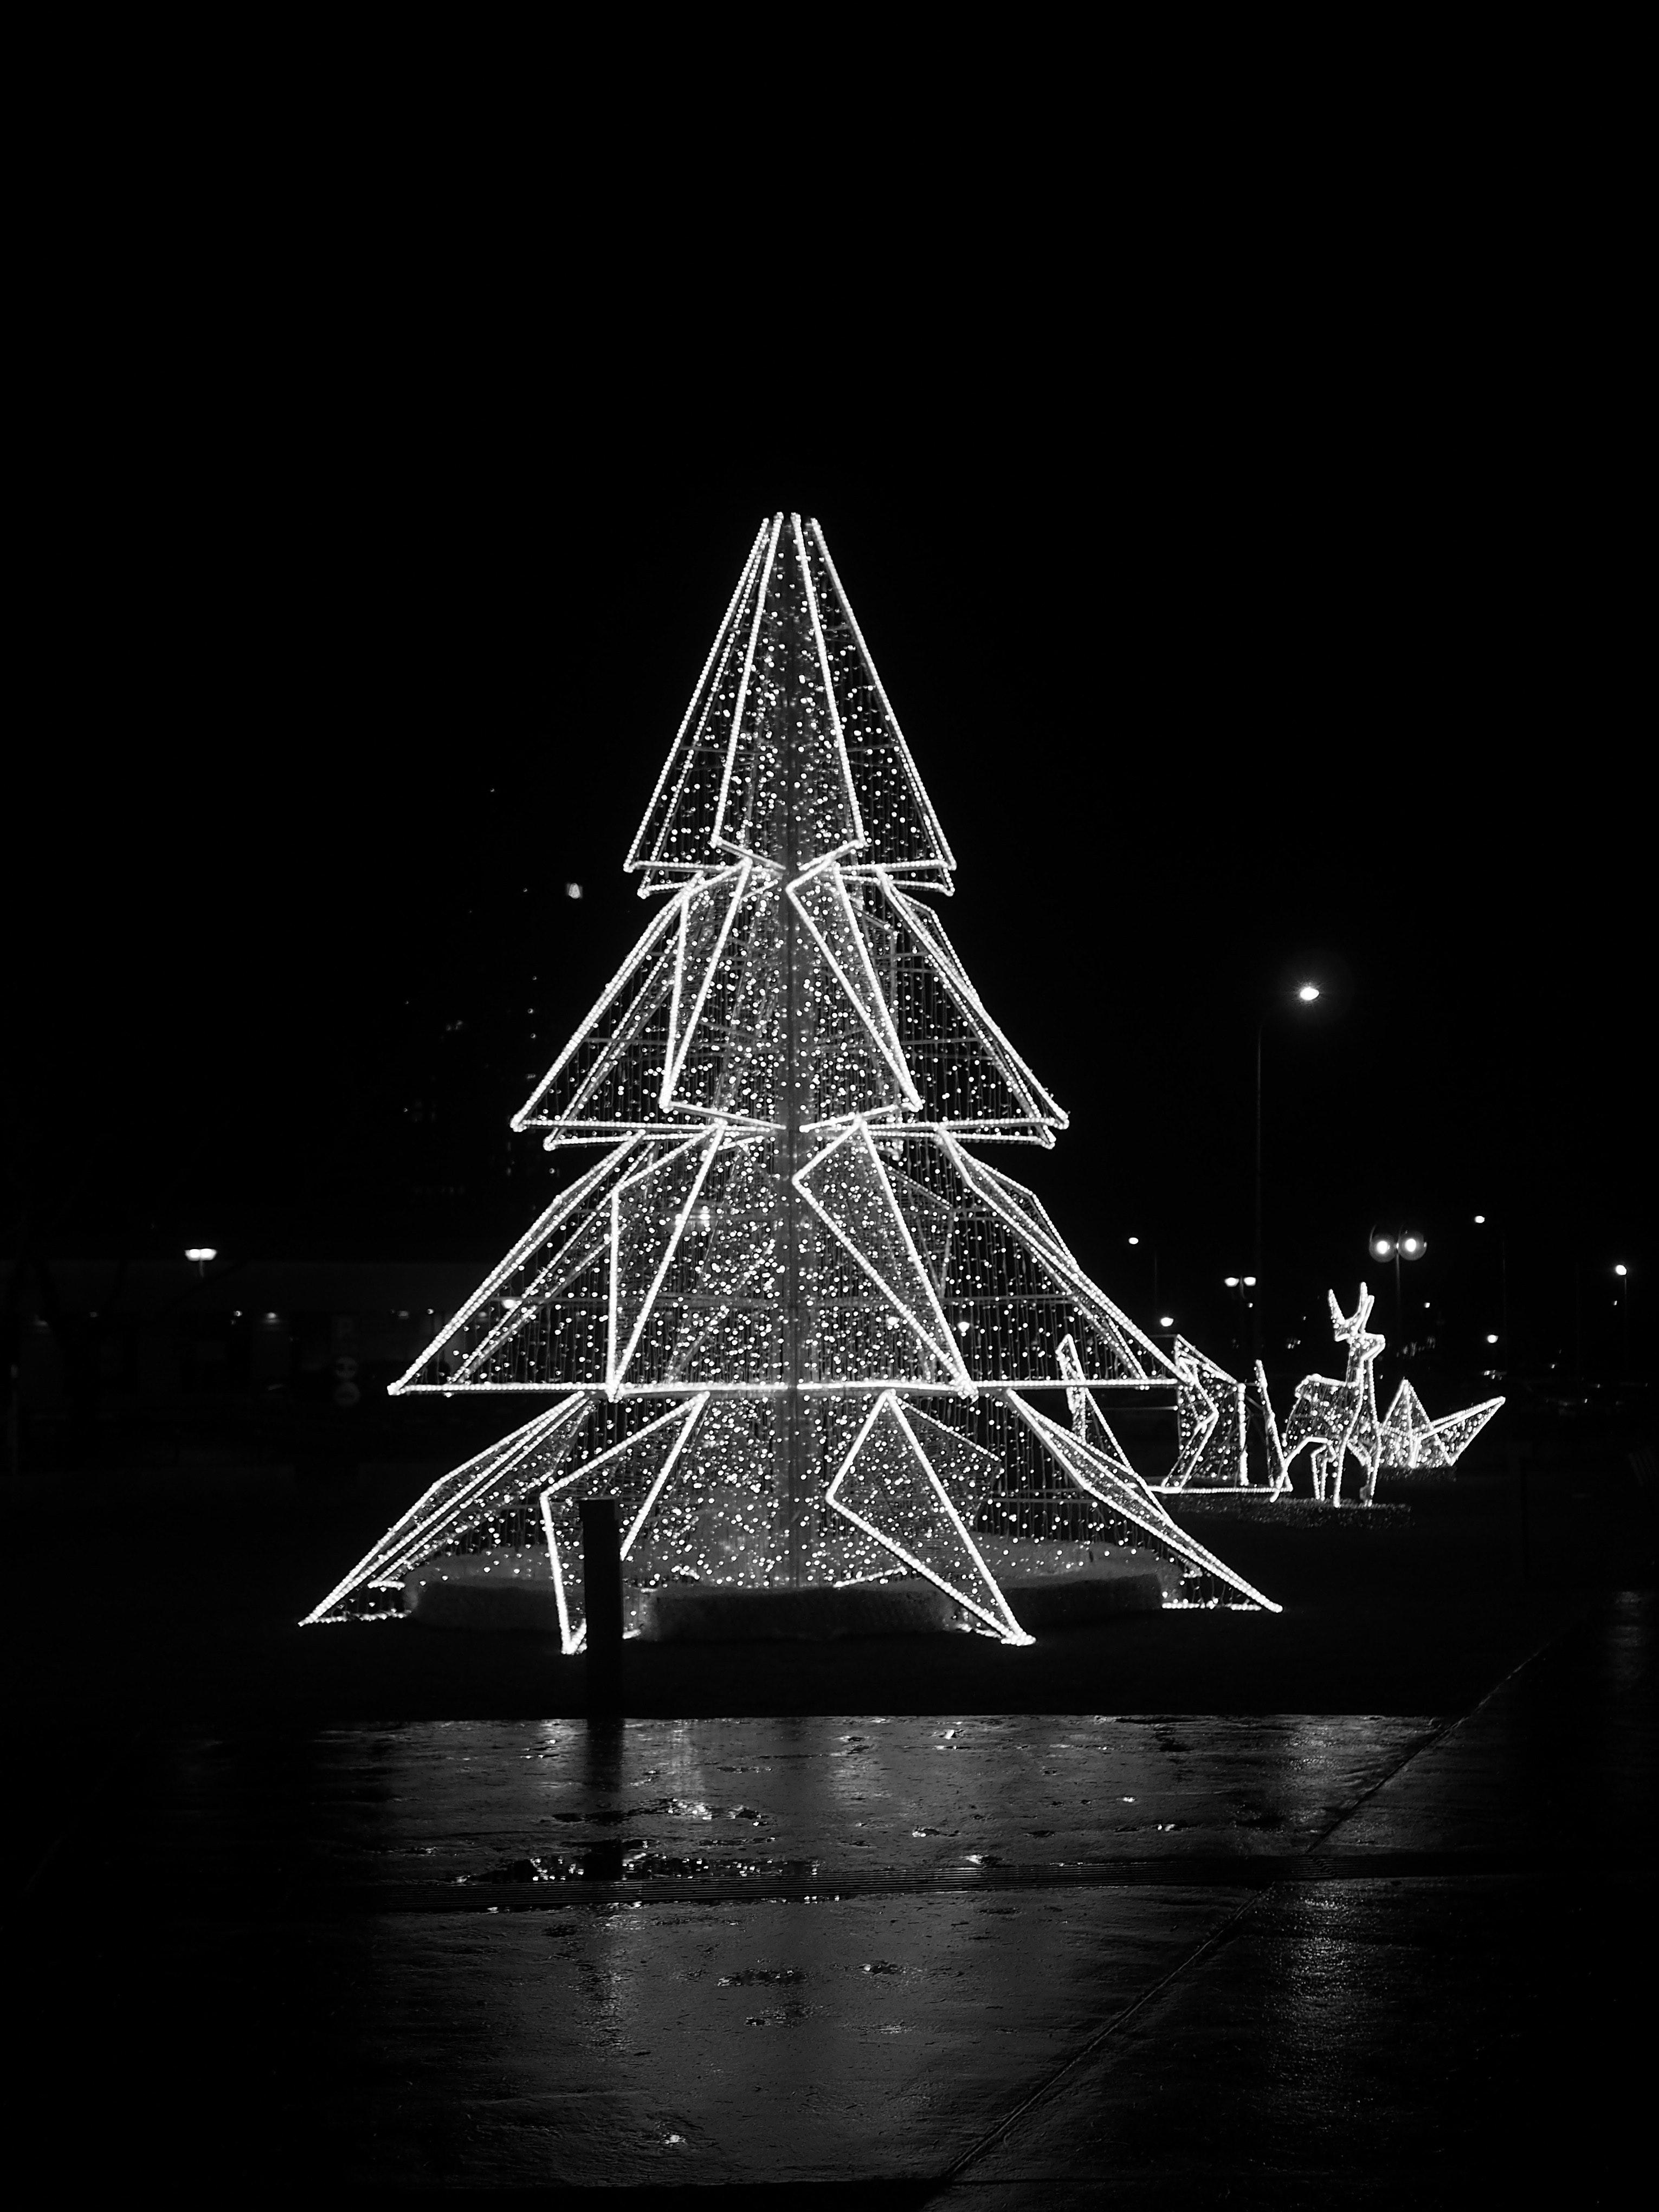 Free stock photo of black and white christmas tree theme christmas